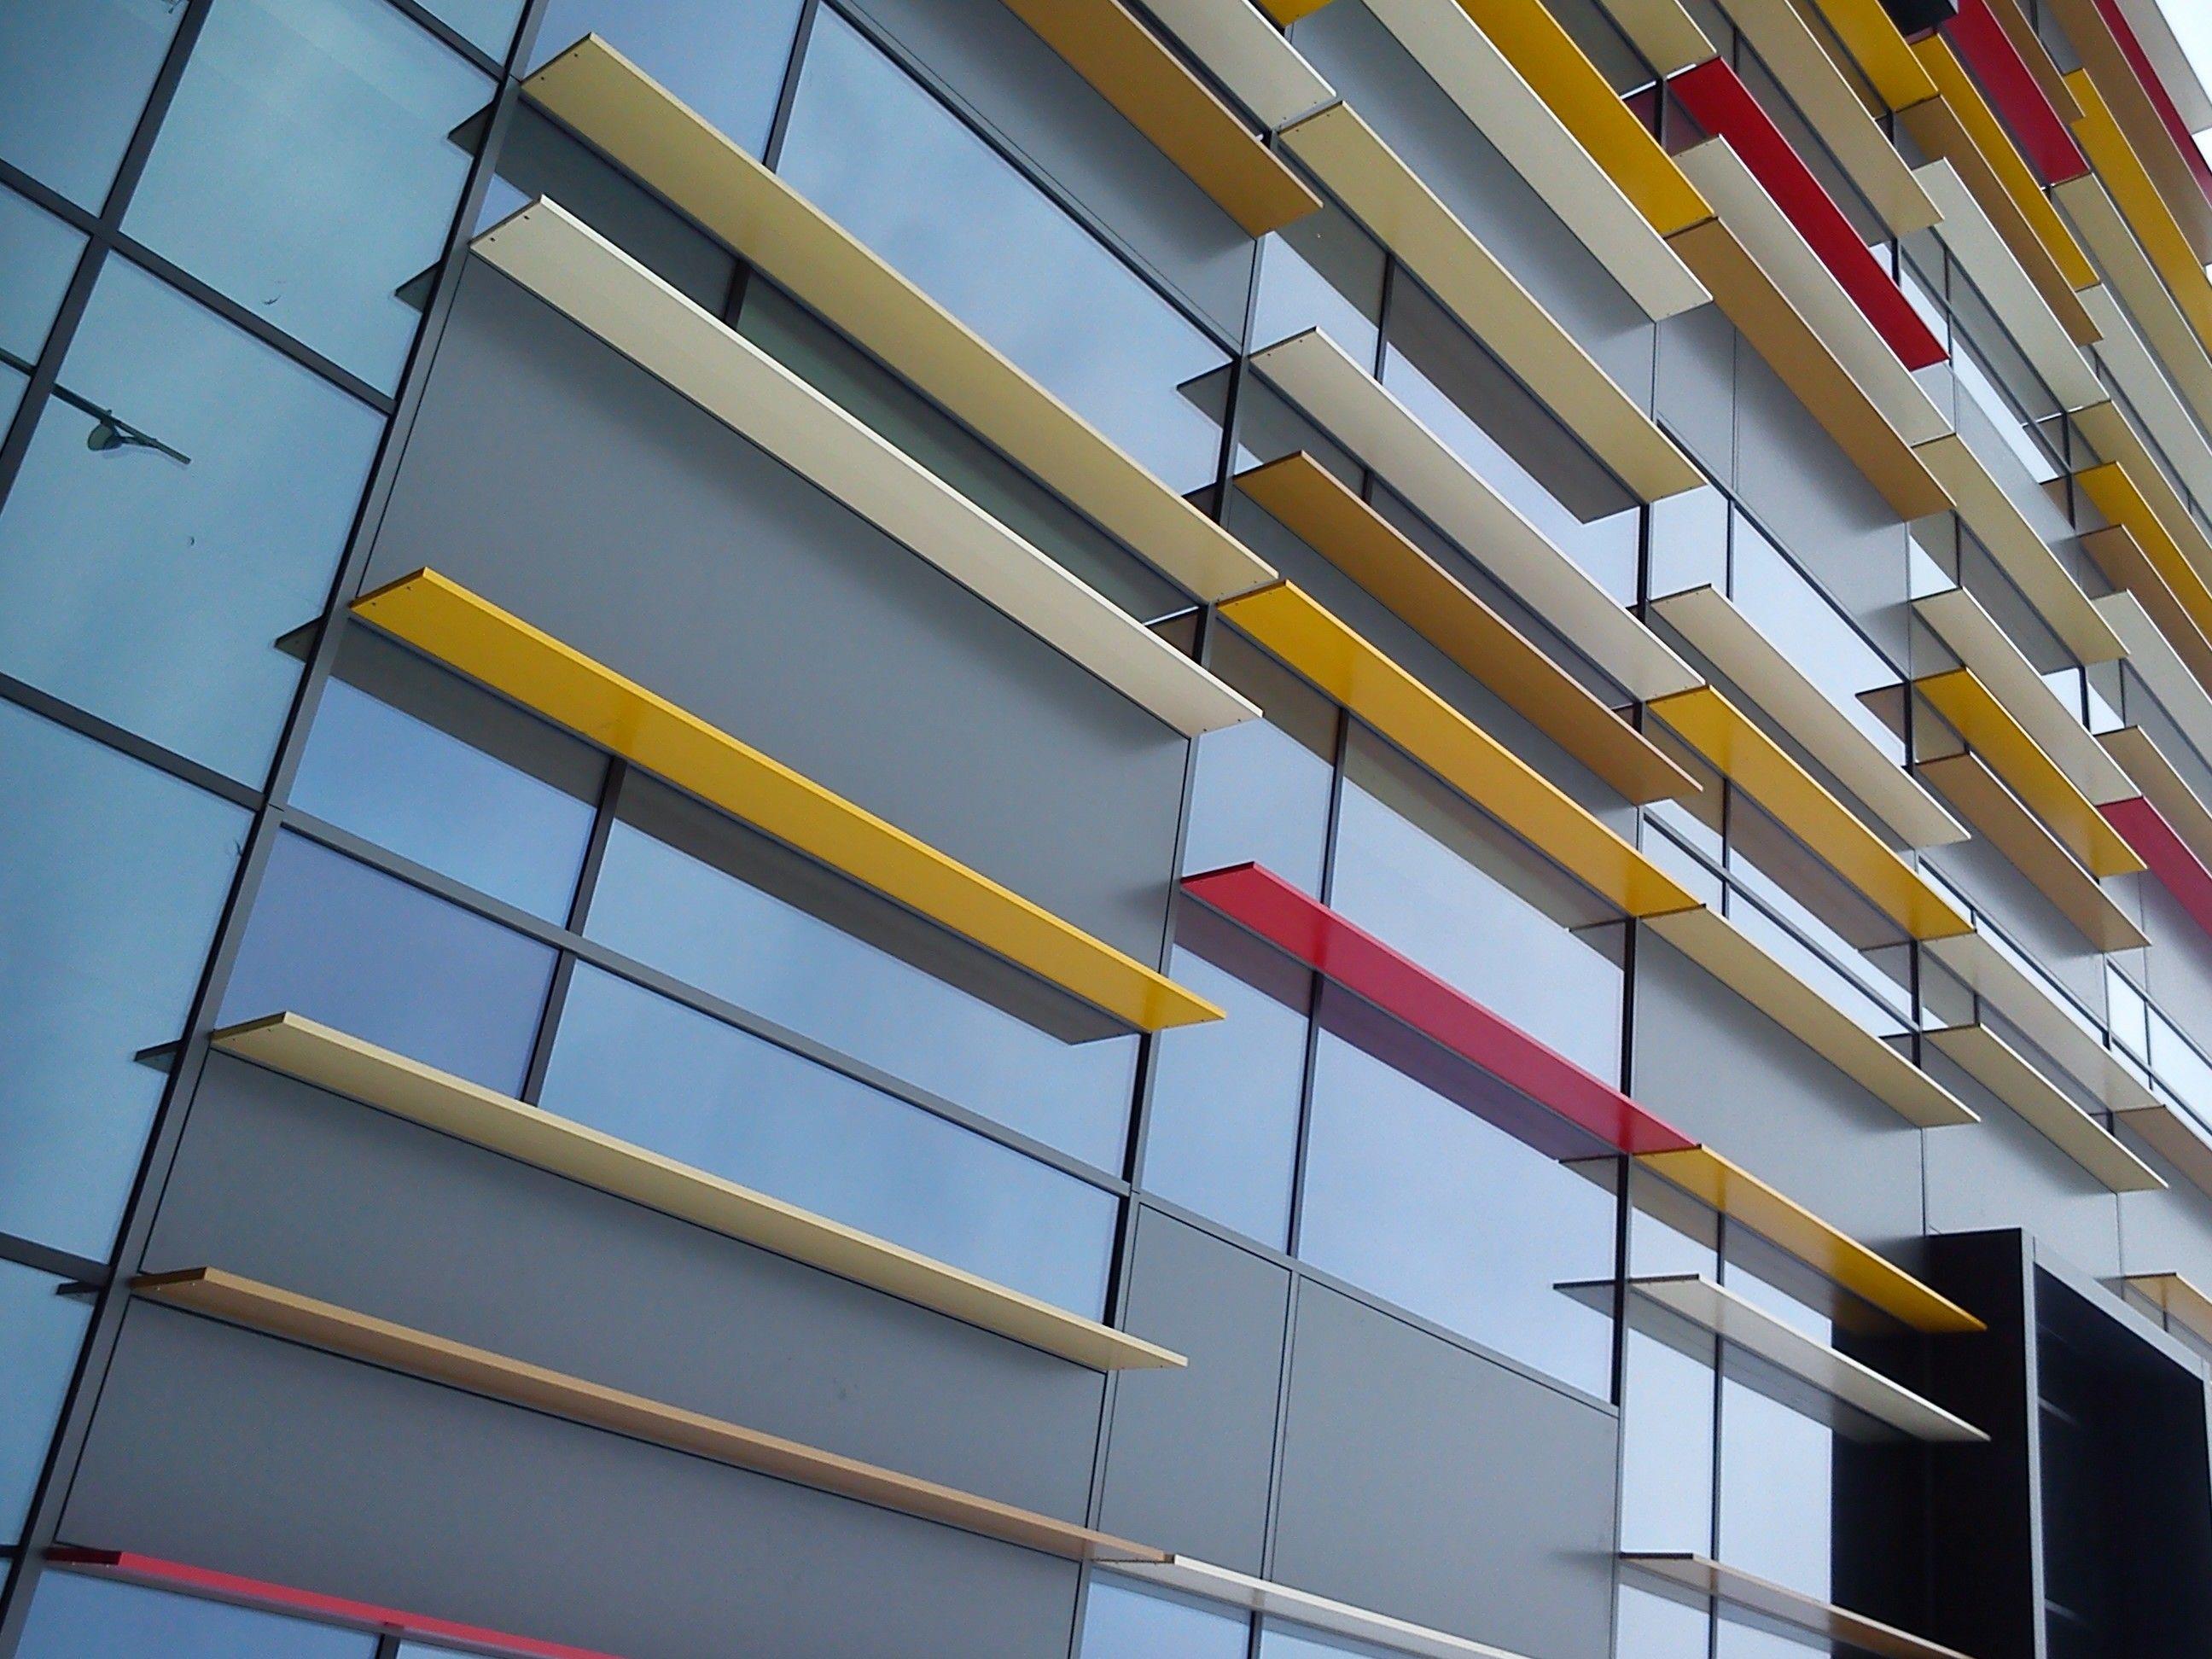 Colourfulled building ufficio